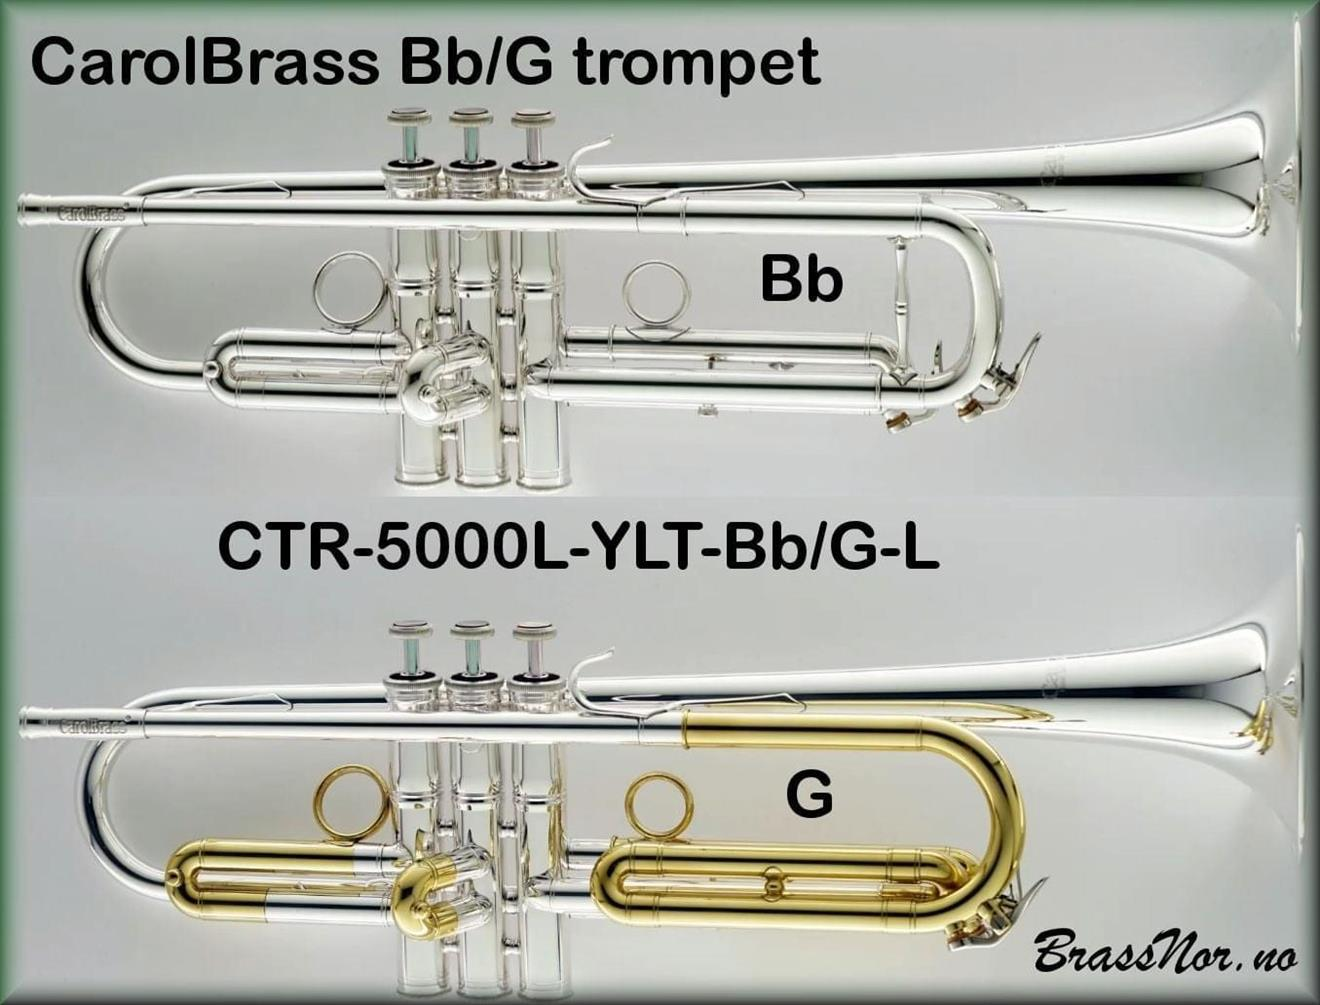 CTR-5000L-YLT-Bb/G-L